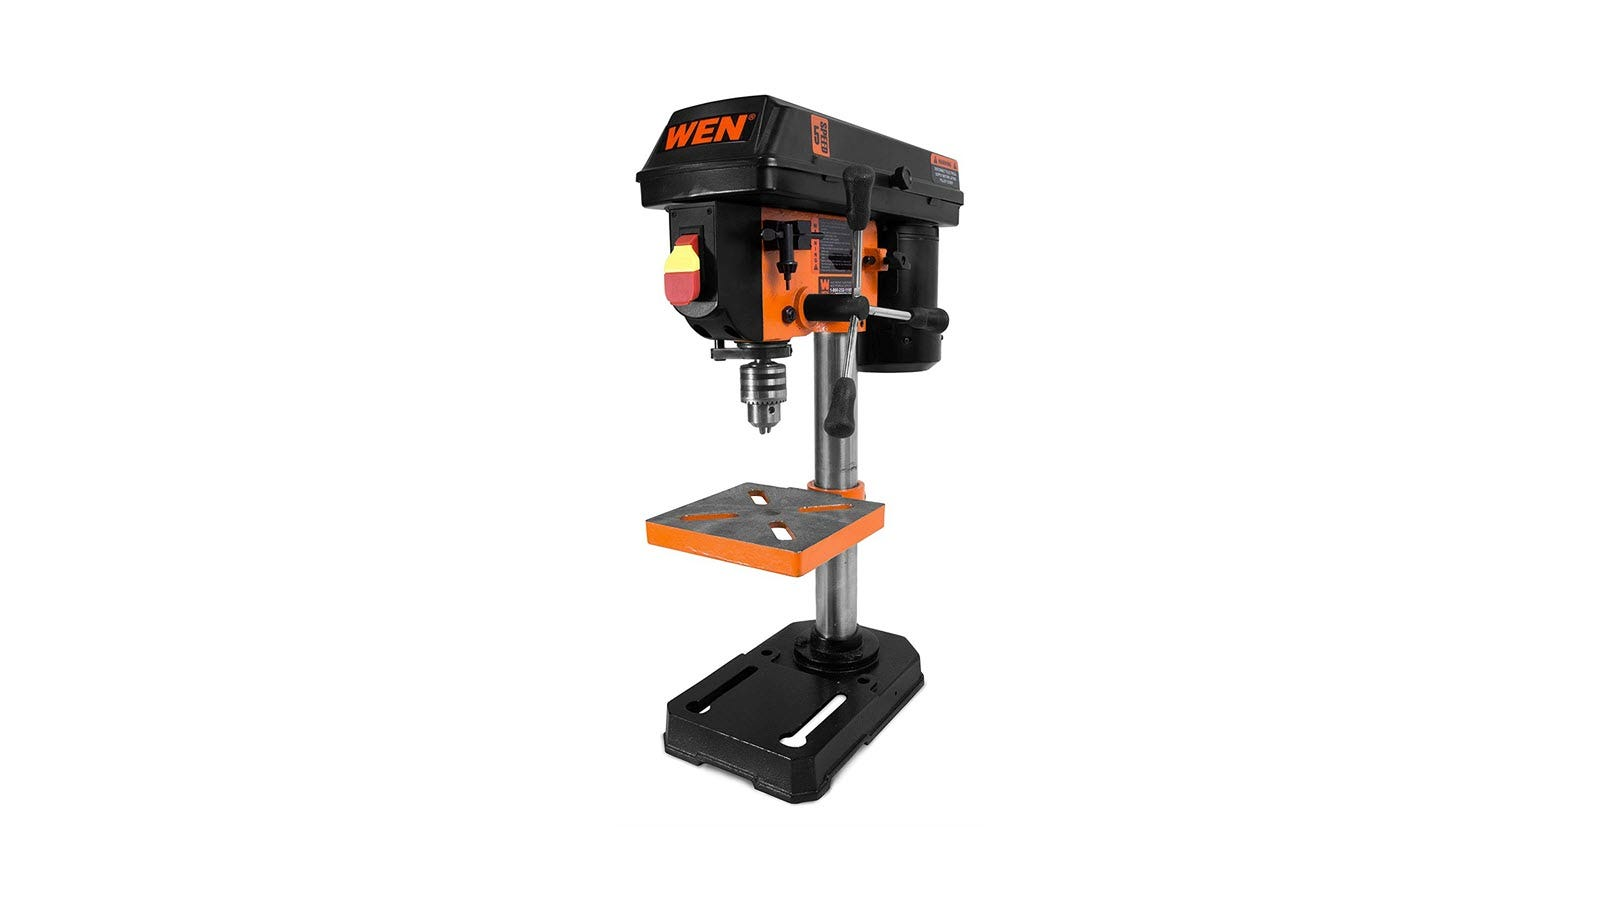 A black and orange WEN 4208 benchtop drill press.